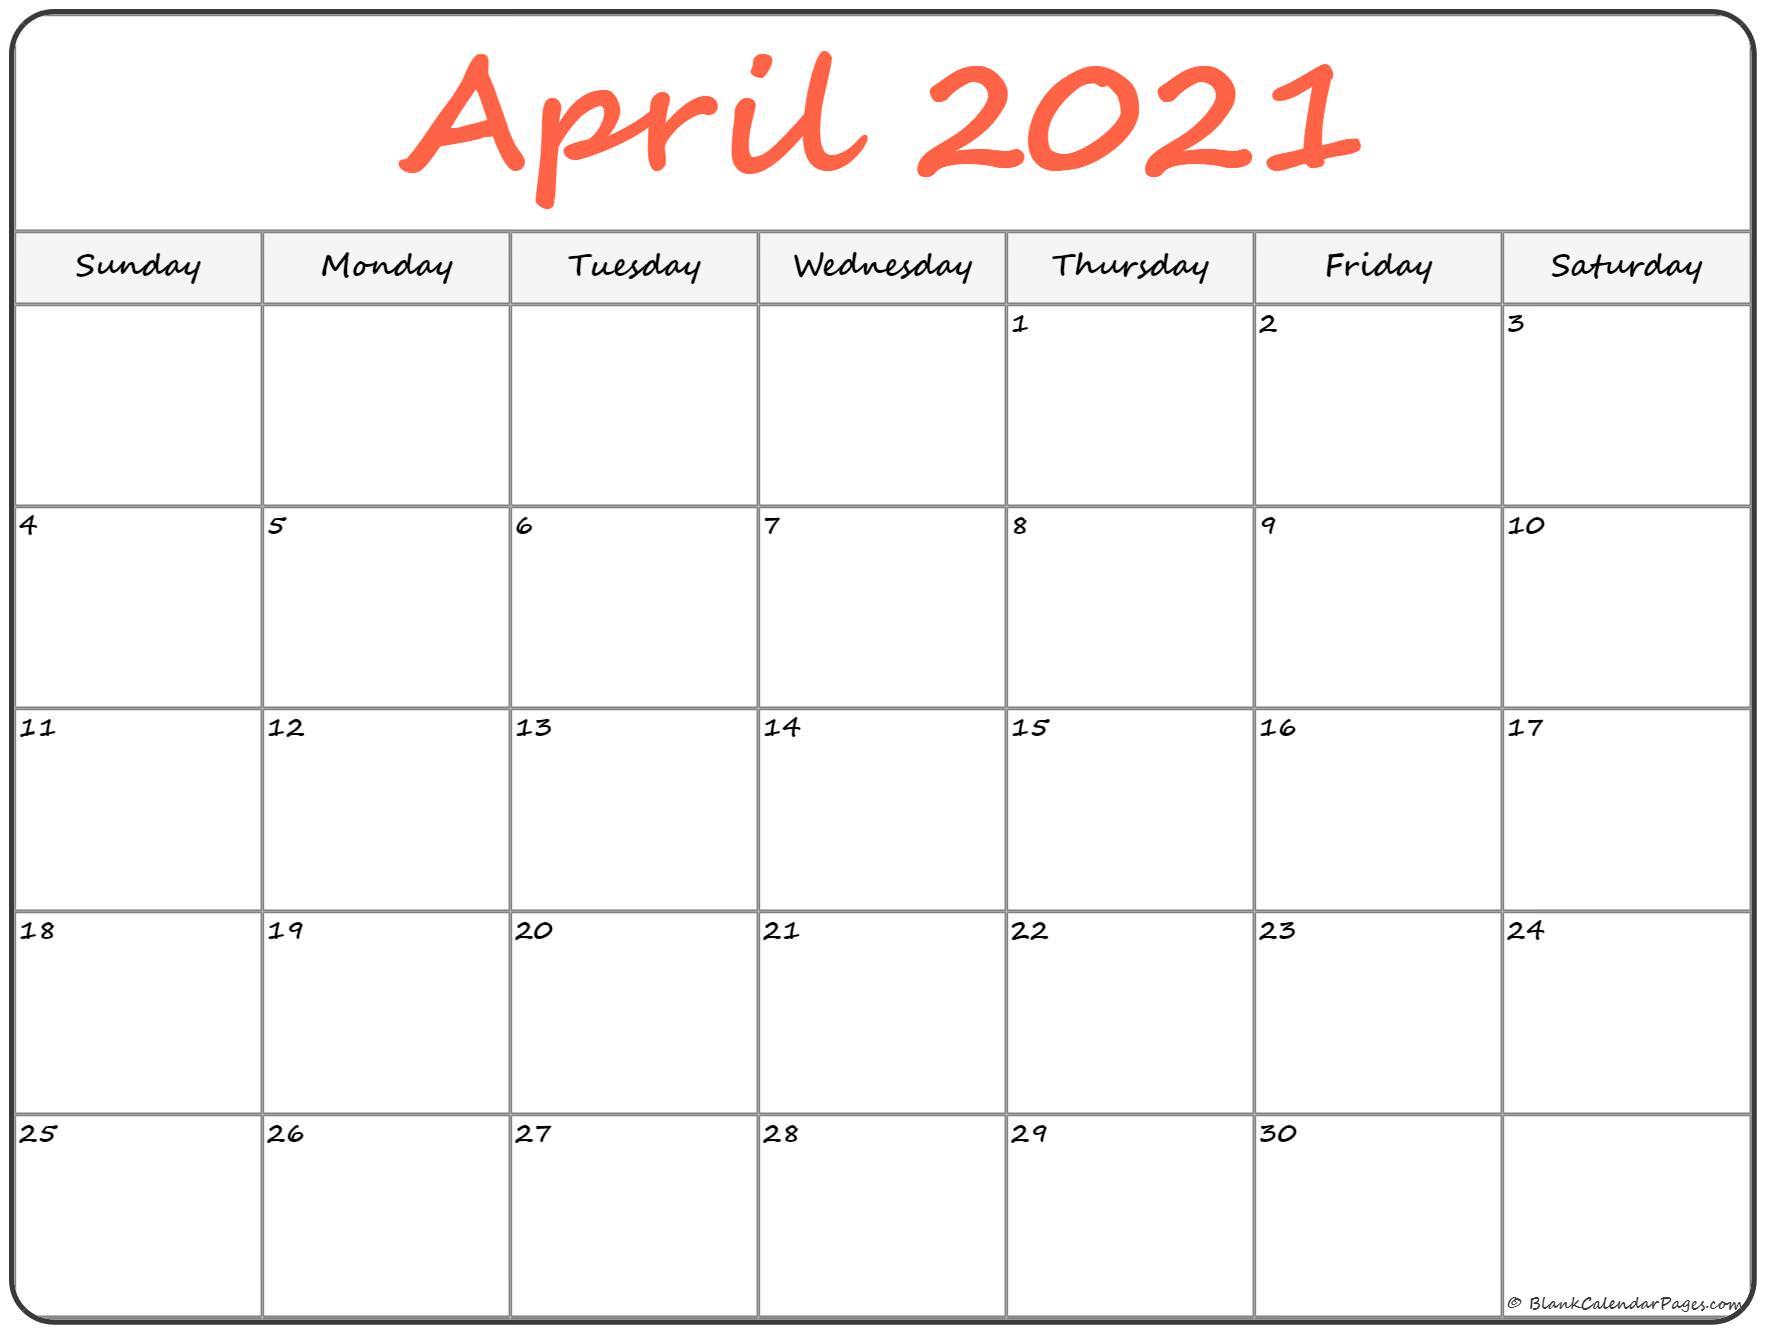 Free April 2021 Calendar Printable - Blank Templates